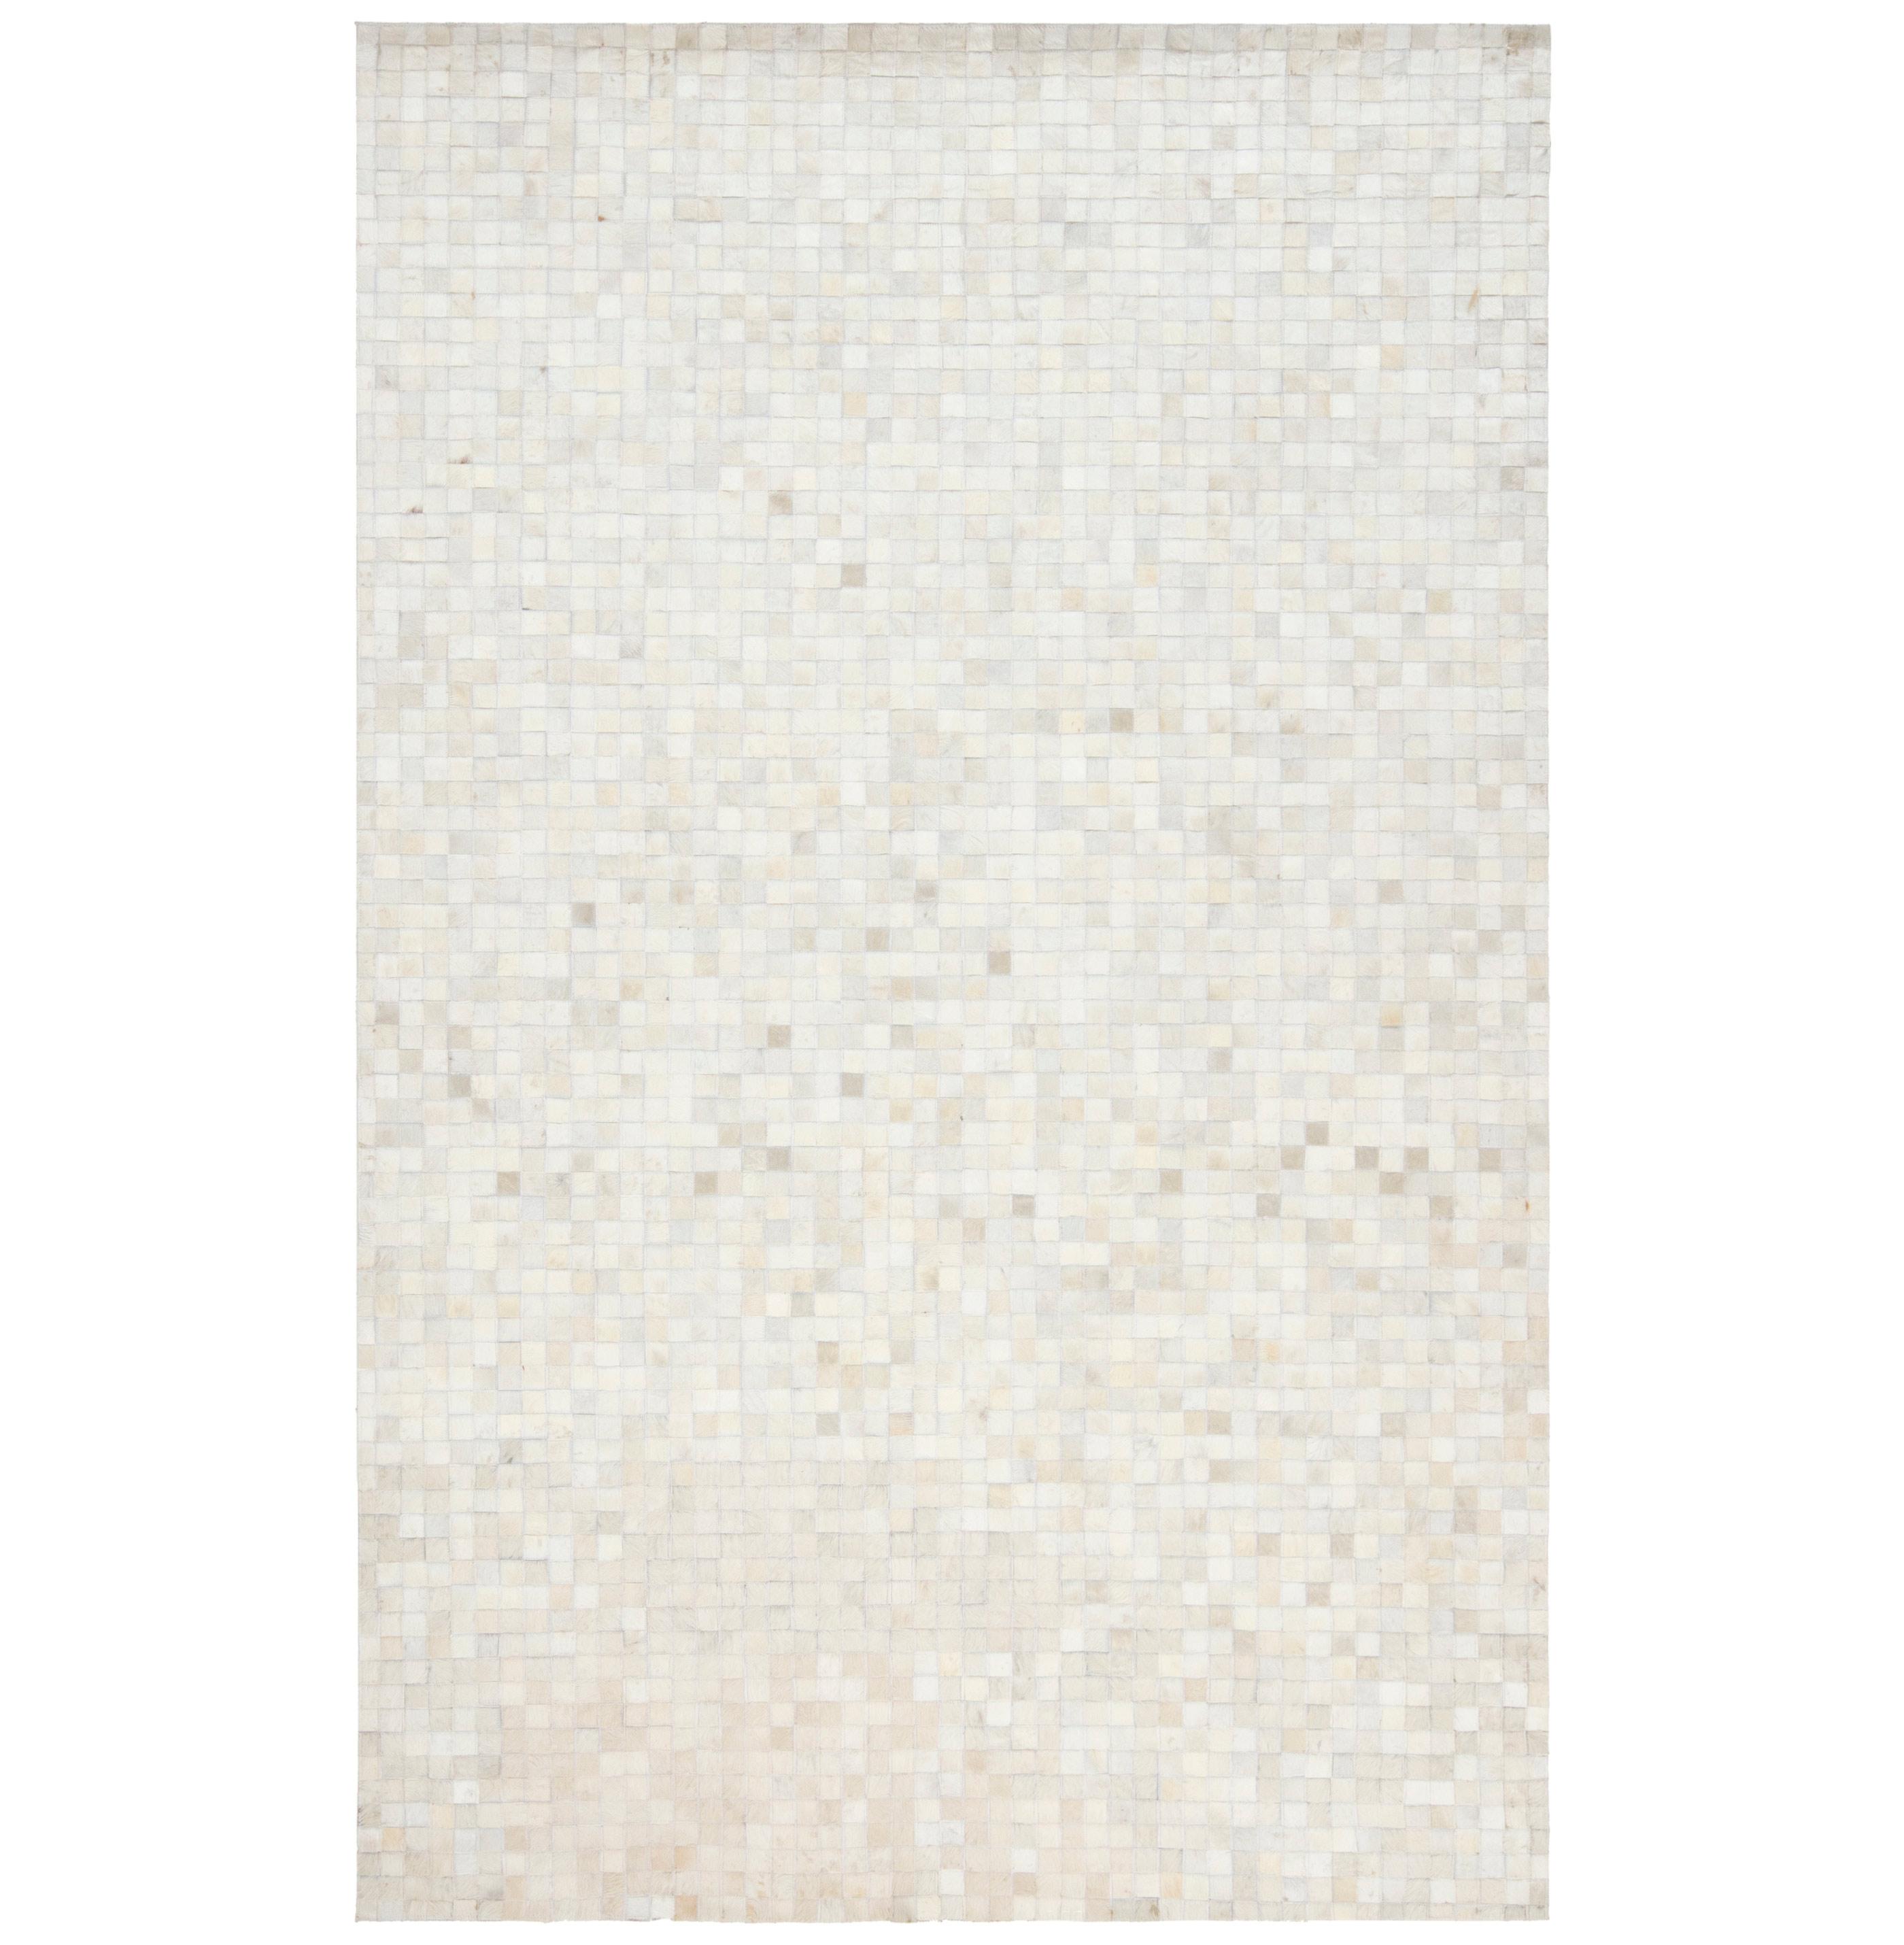 Kochi Global Bazaar Tile Ivory White Cowhide Rug - 8x10